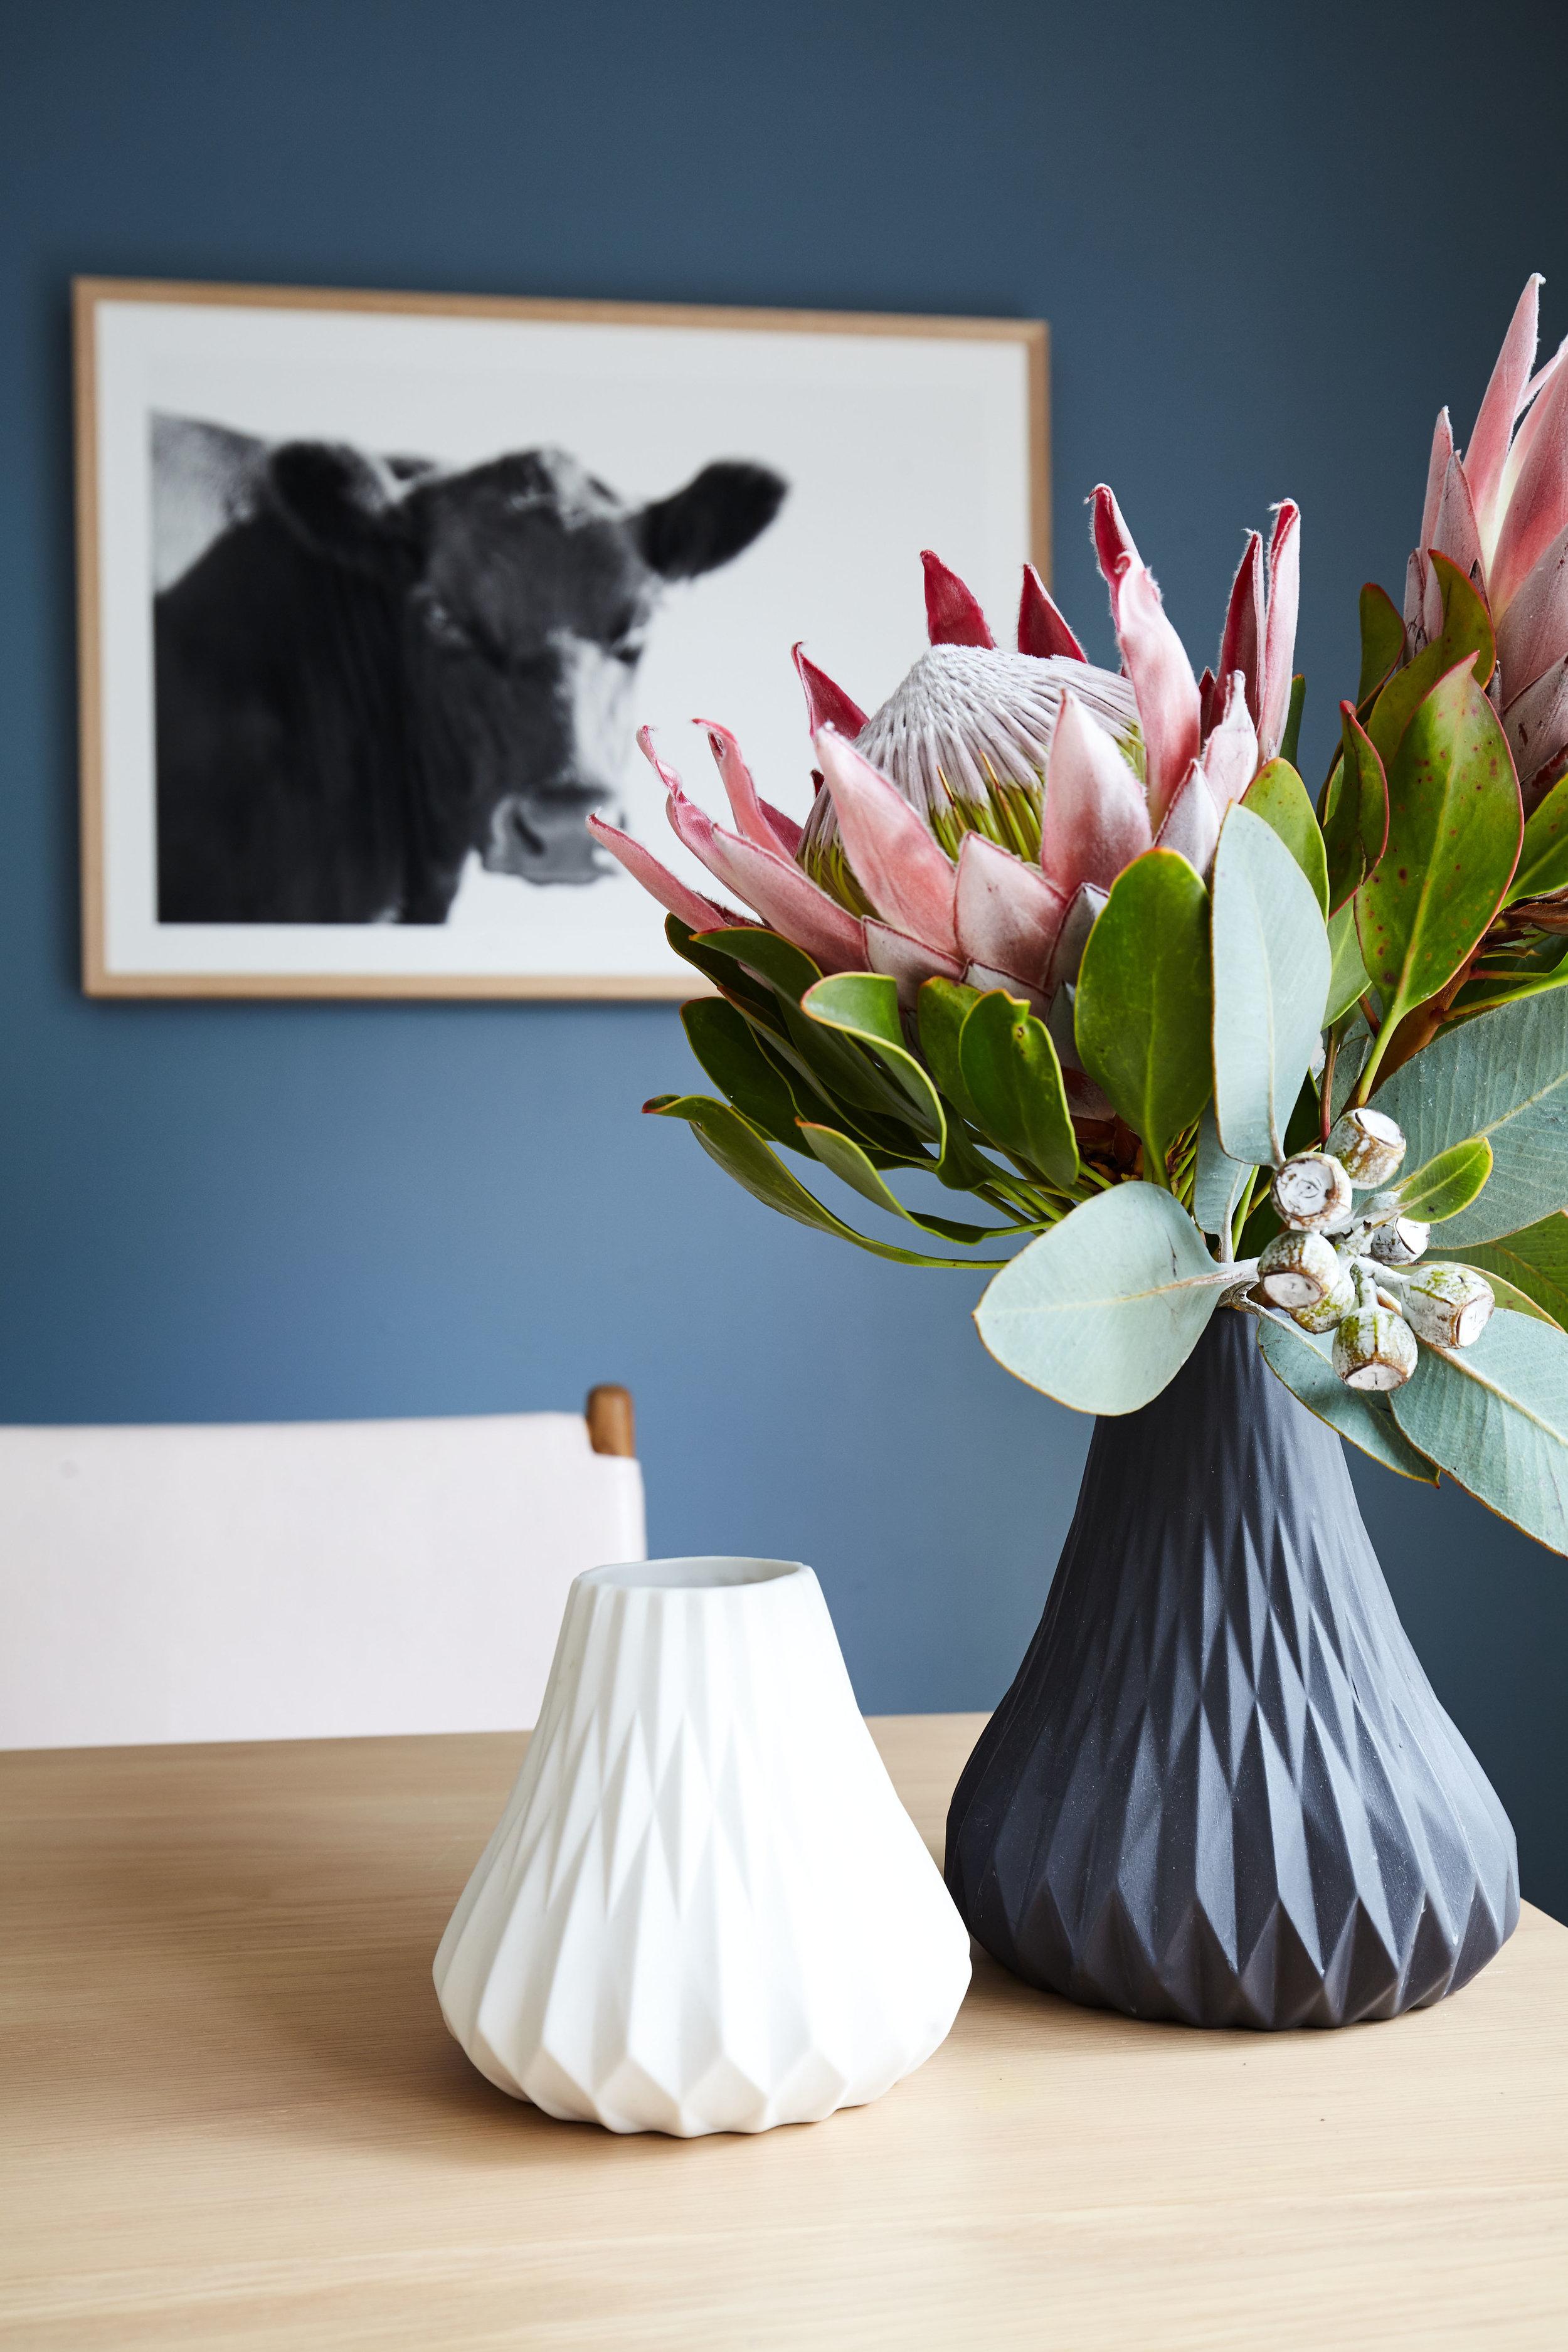 Maitland Street Interiors, Sarah Elshaug, Interior Stylist Melbourne, The MSI Studio, Home Office, Elsie + Hugo, Cow Prints, Limited Edition Artwork